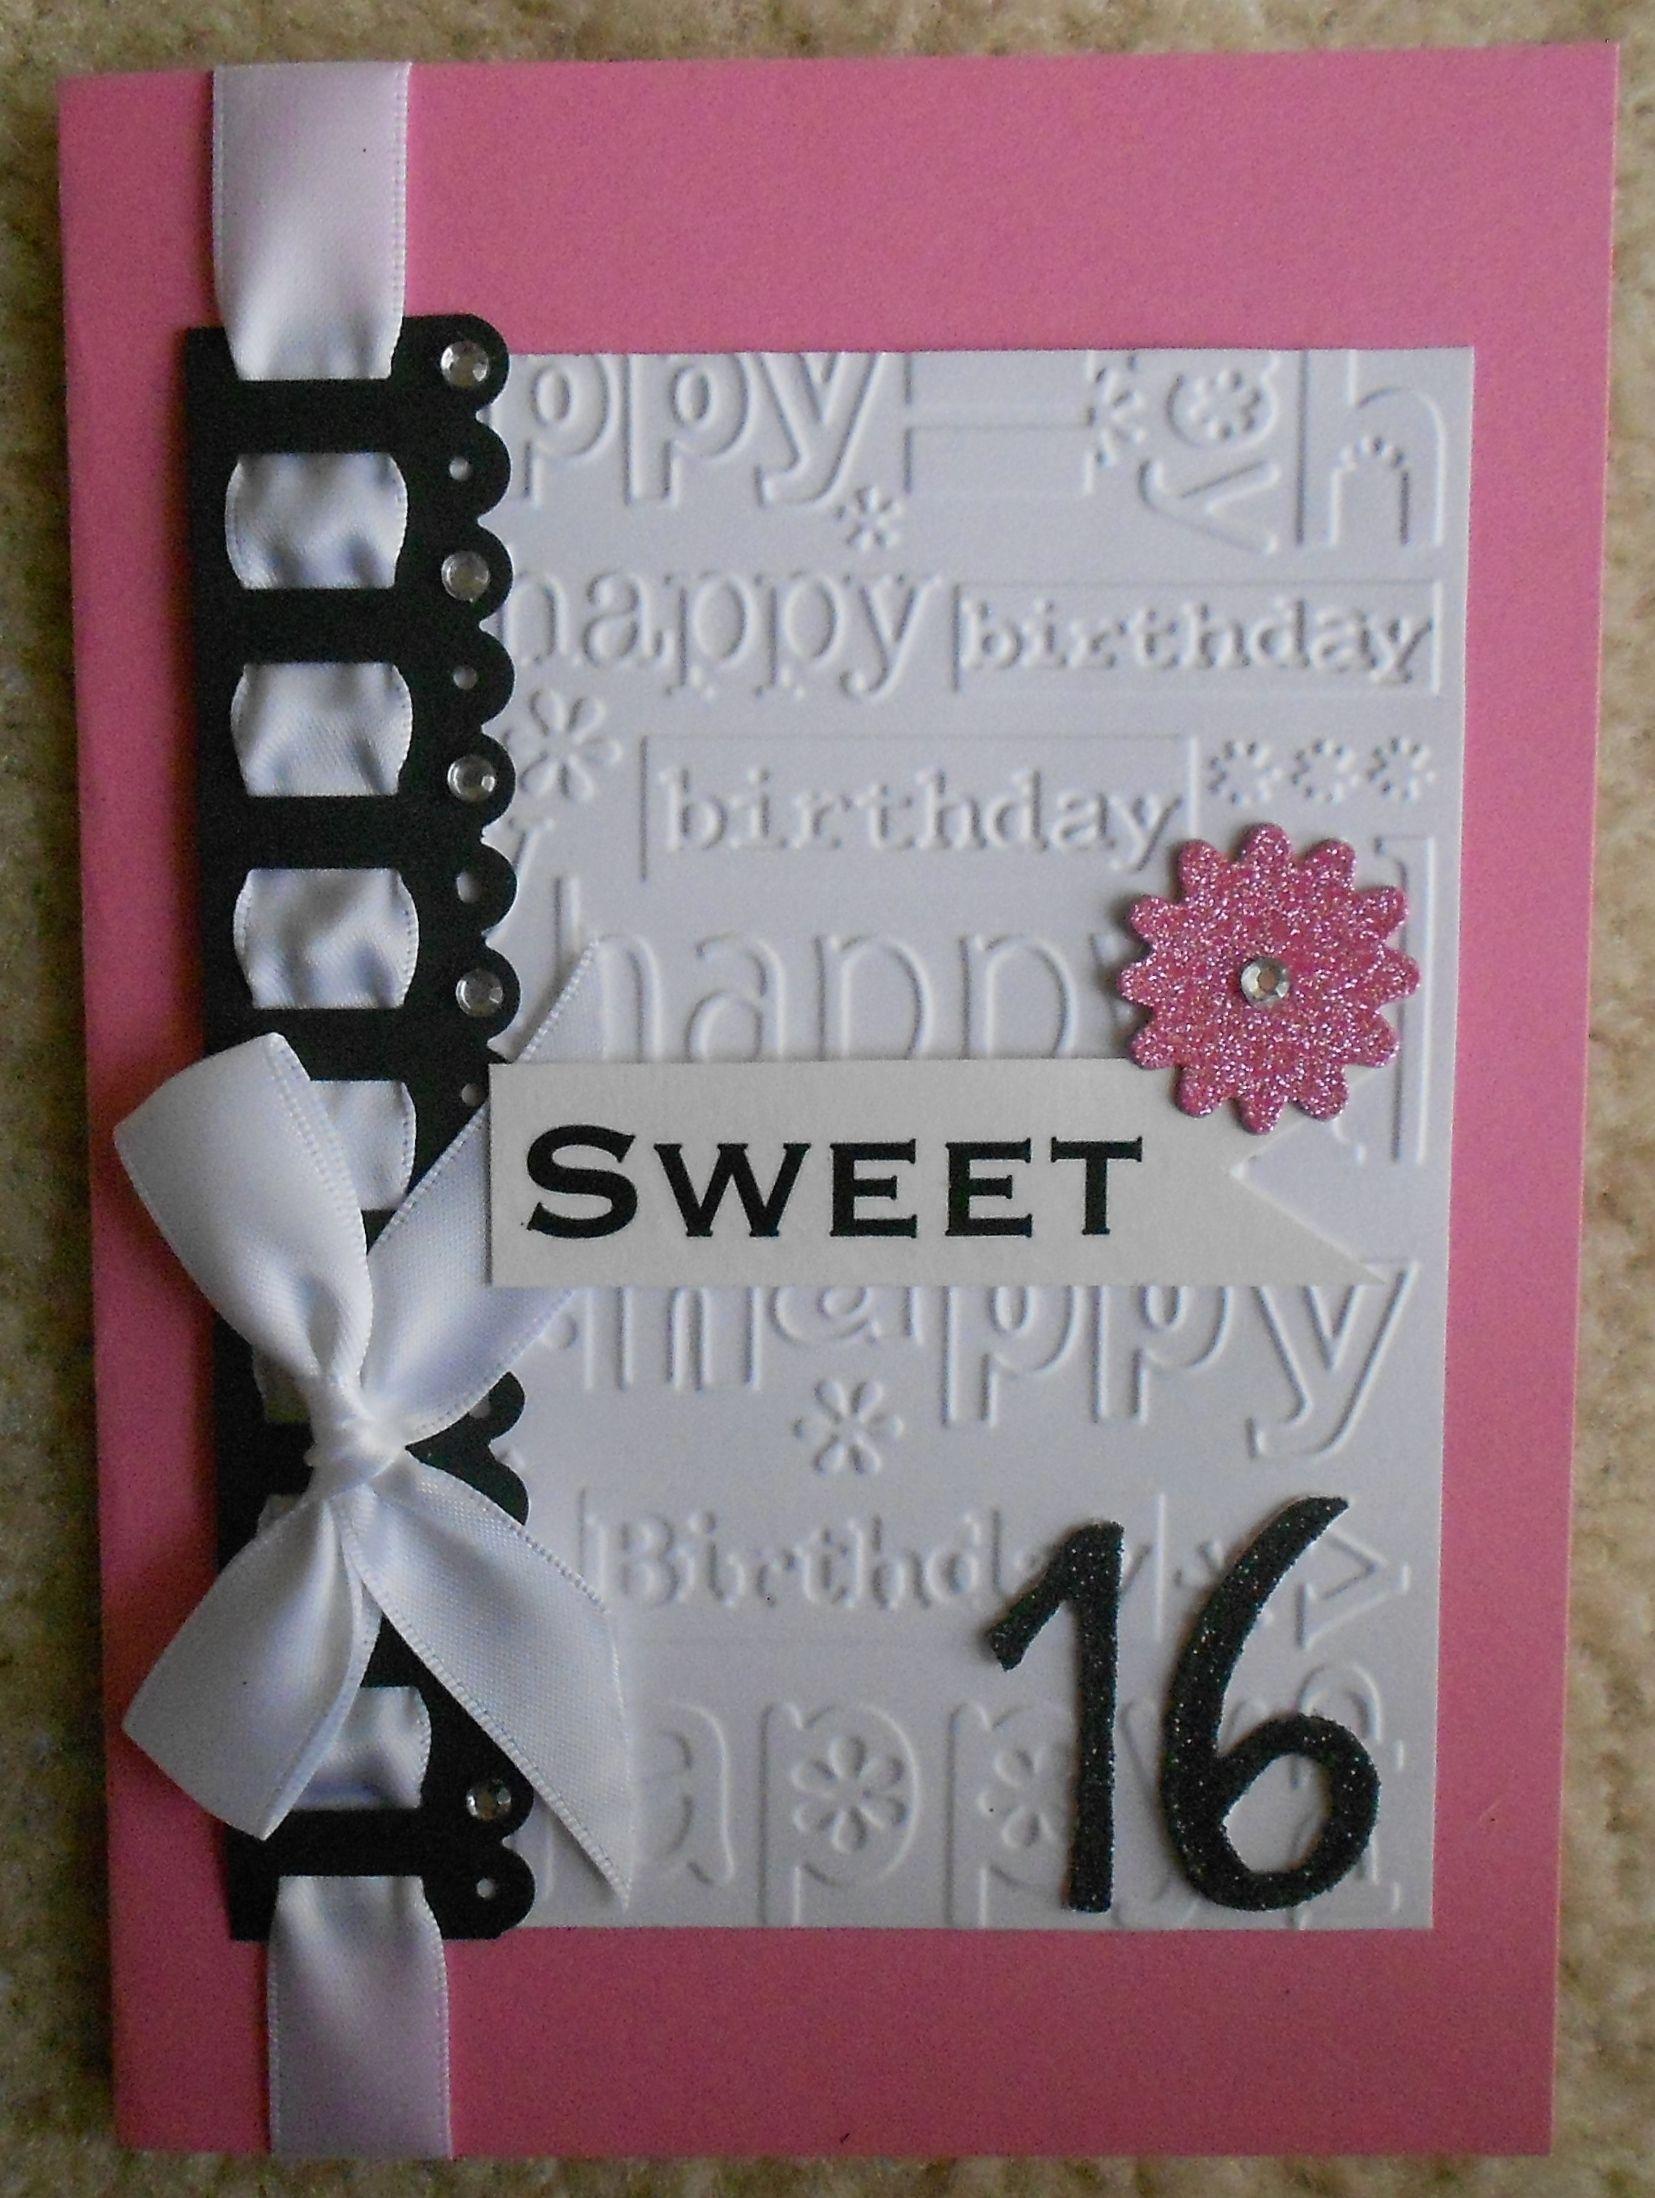 Handmade Sweet 16 birthday card Card ideas Pinterest – Sweet 16 Birthday Card Ideas